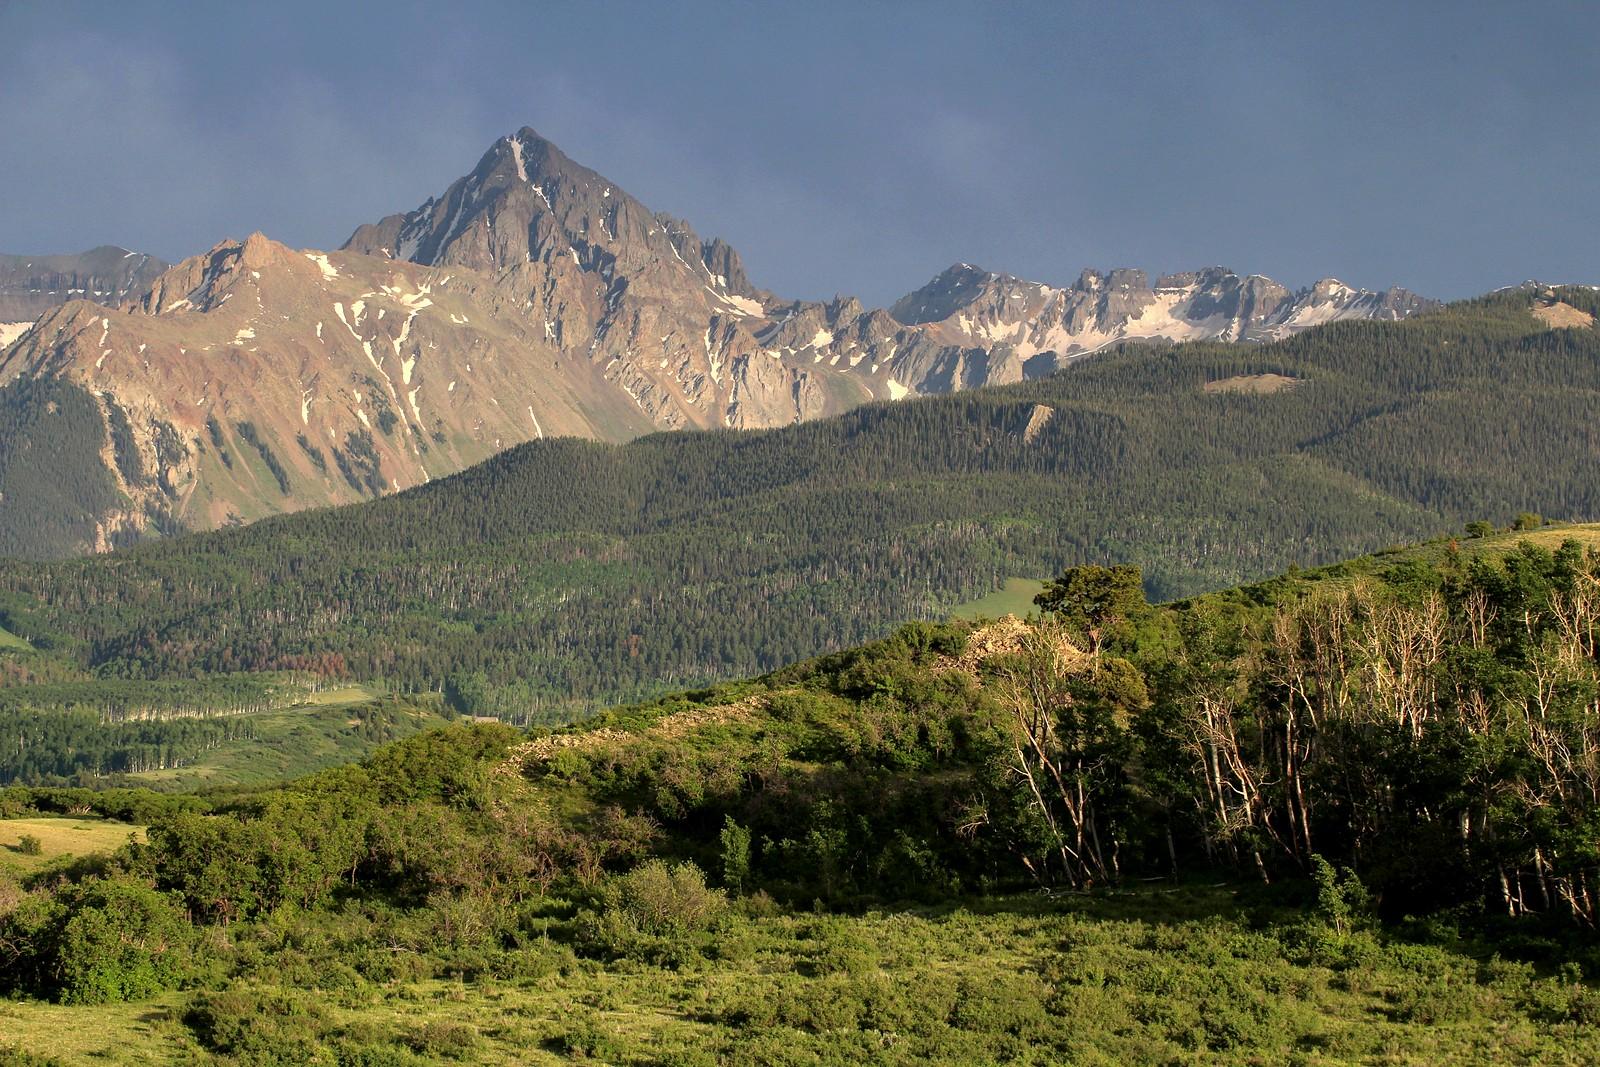 Mt. Sneffels from Dallas Divide